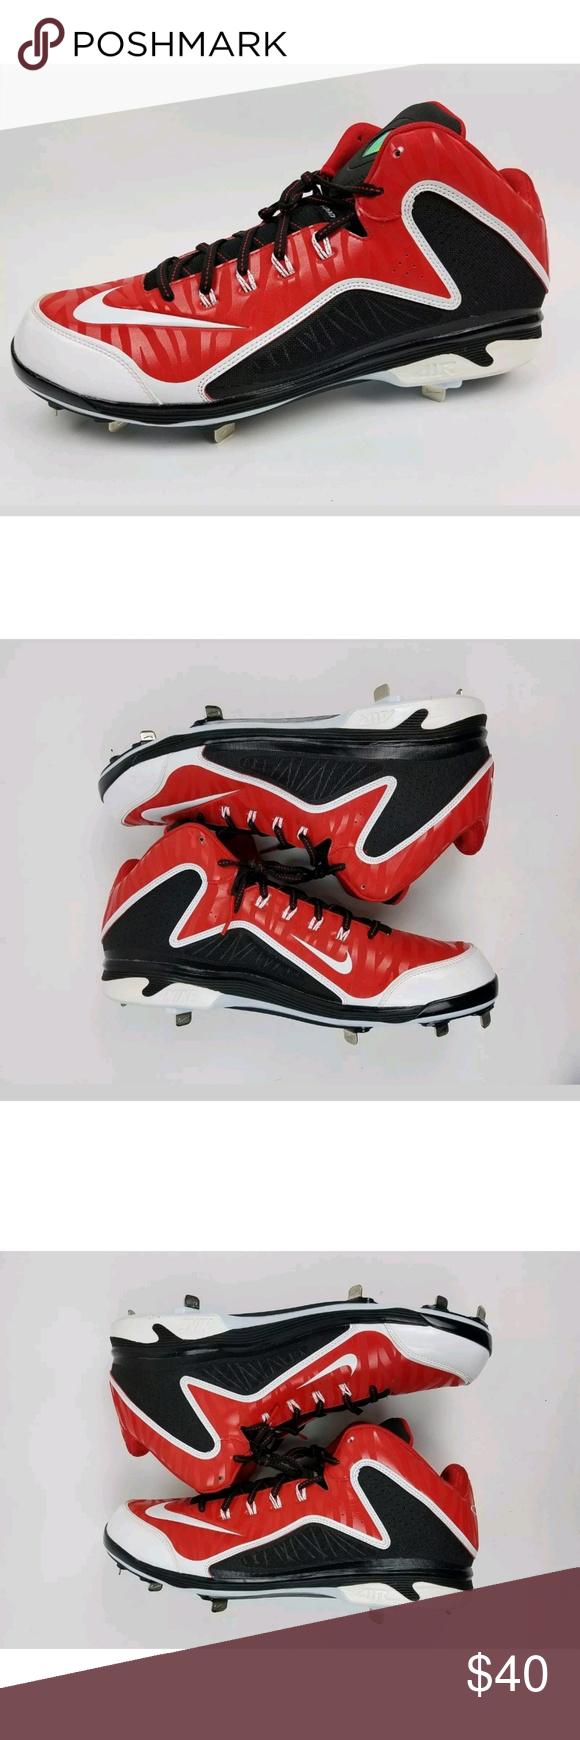 Nike Air Swingman Mvp 2 Metal Baseball Cleats Baseball Cleats Nike Metal Baseball Cleats